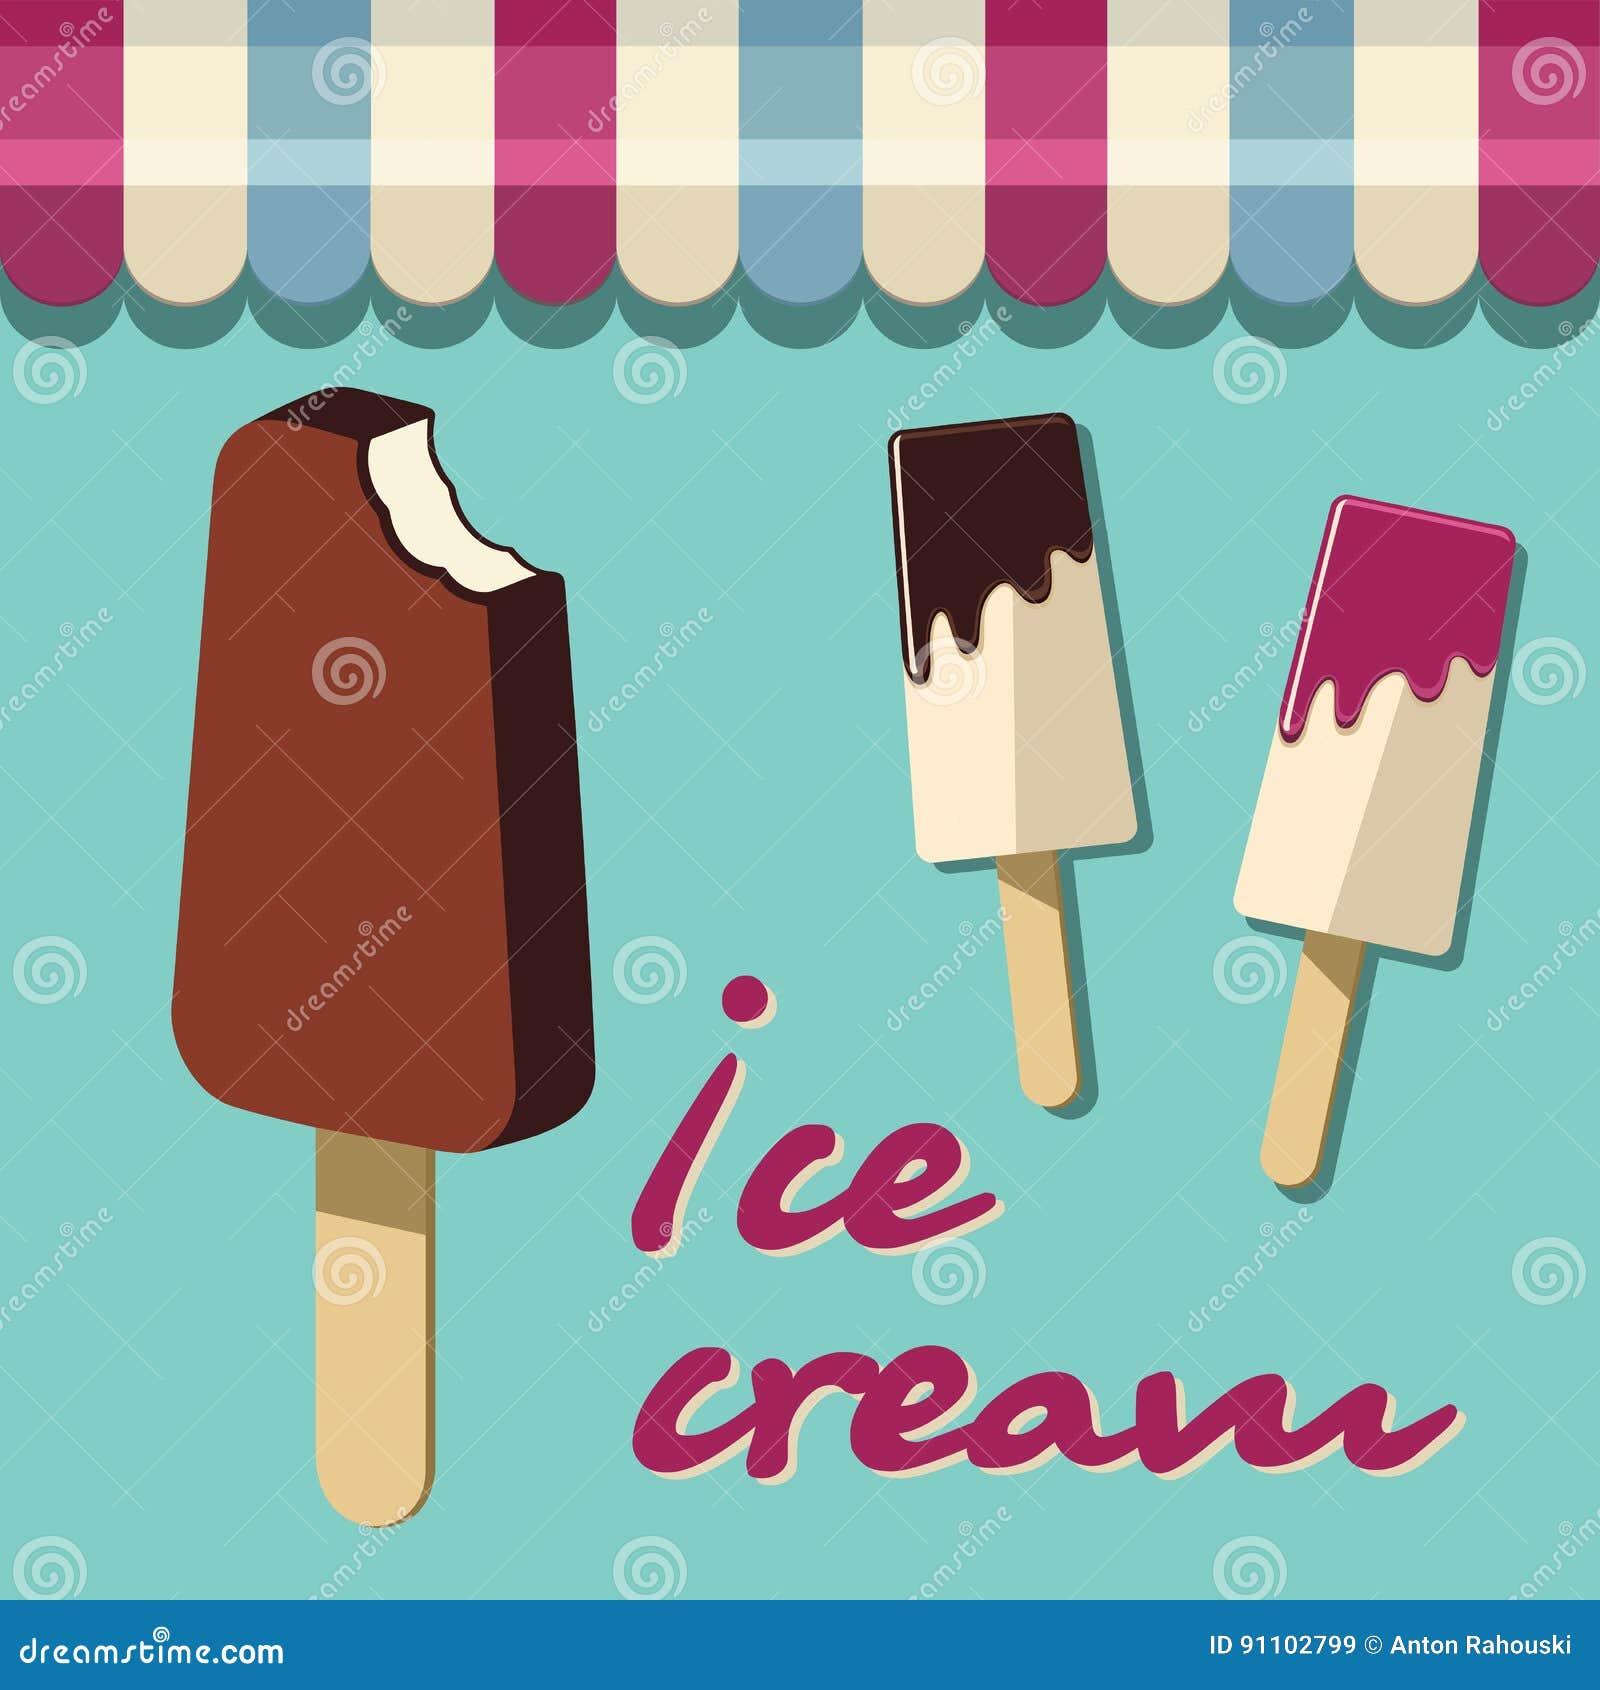 Dessert Yummy Ice Cream Wallpapers: Retro Ice Cream Poster. Vintage Illustration Sign